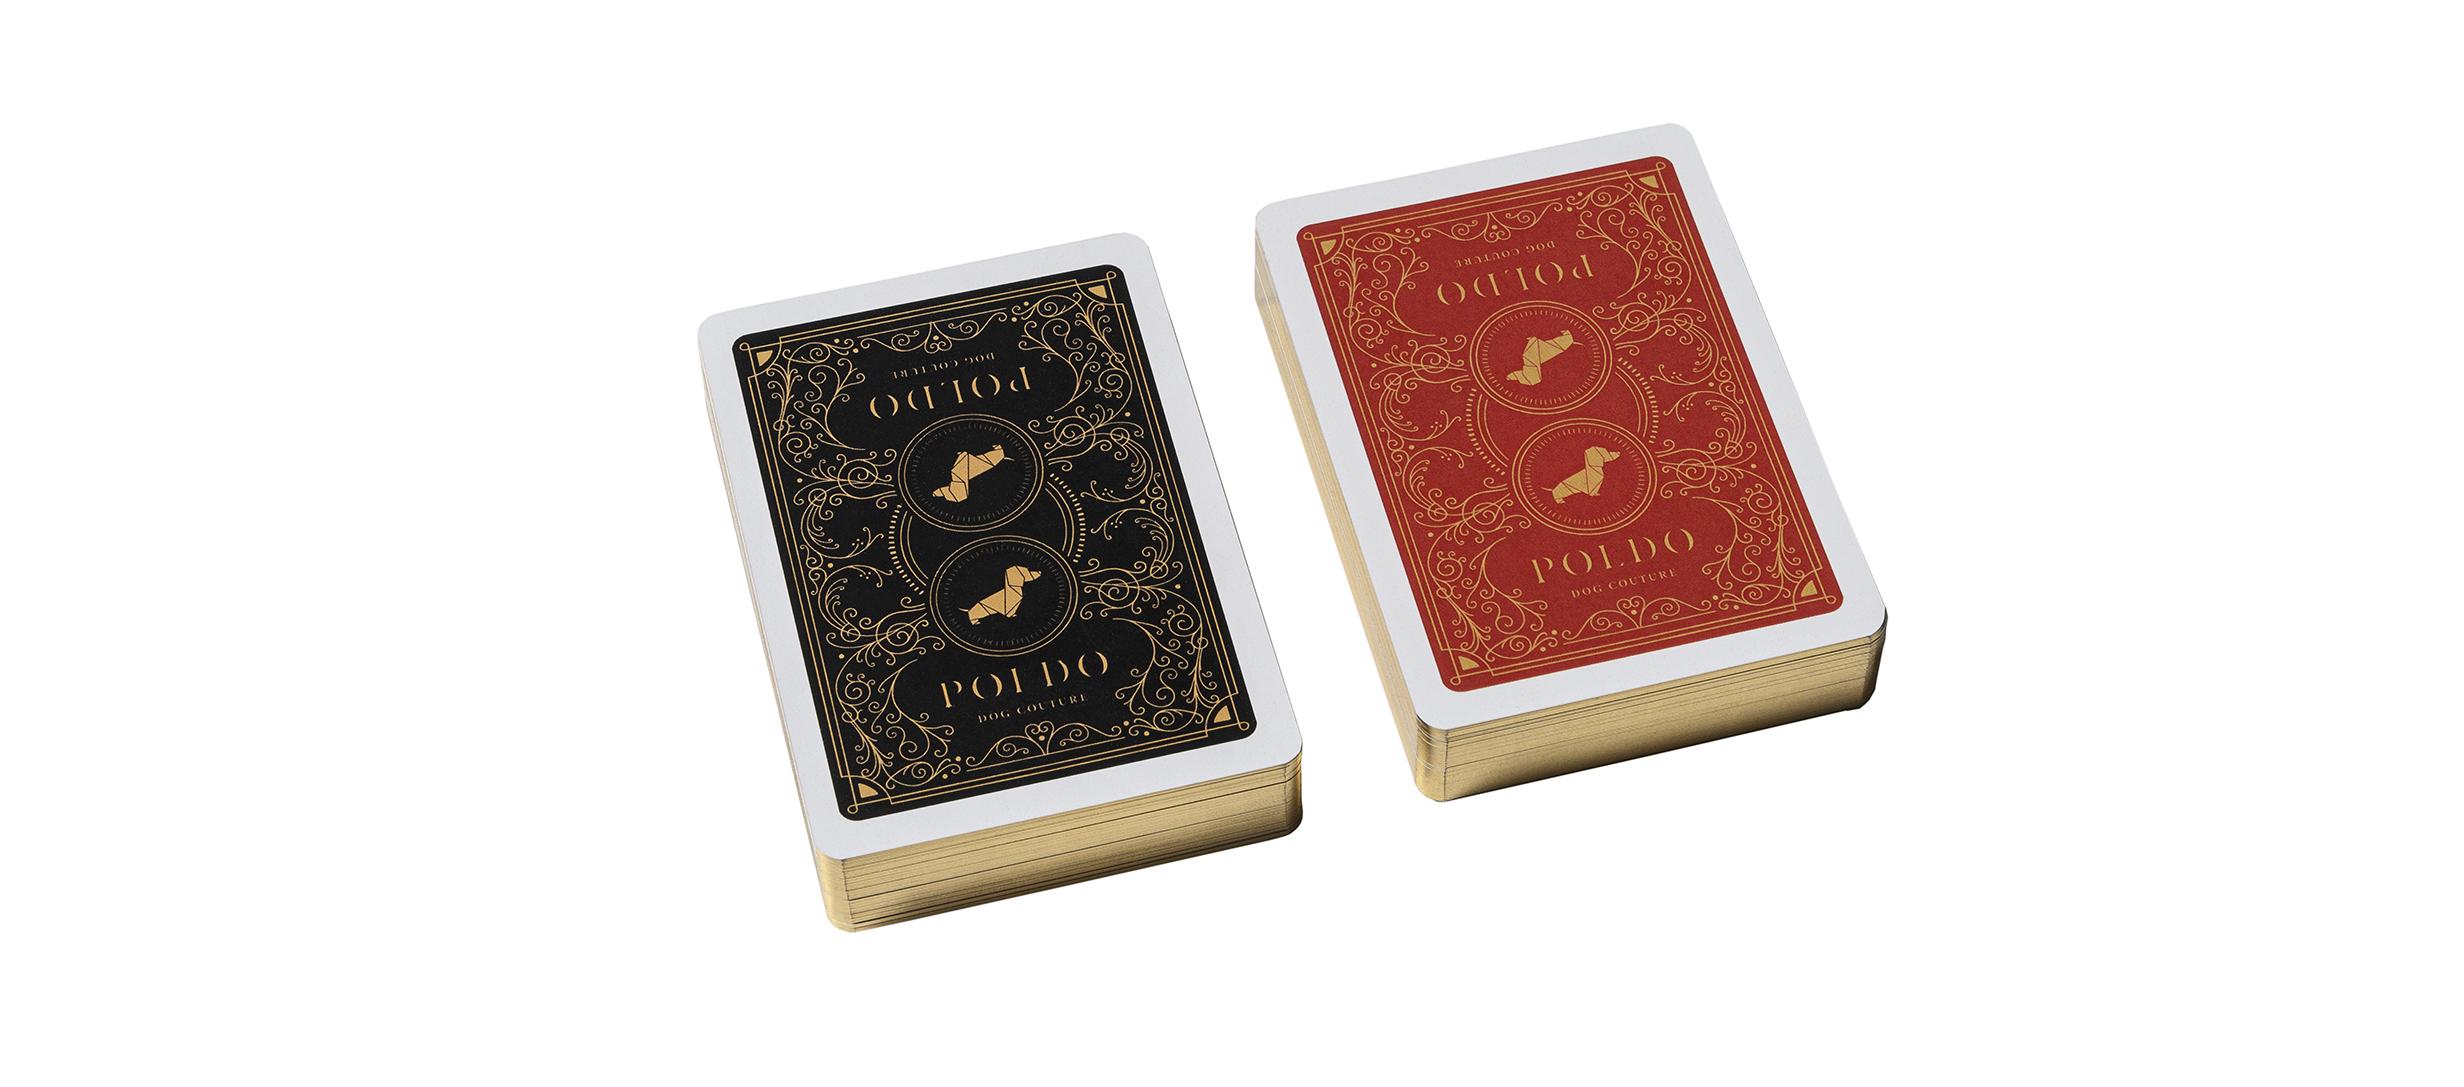 poldo dog couture playing cards decks